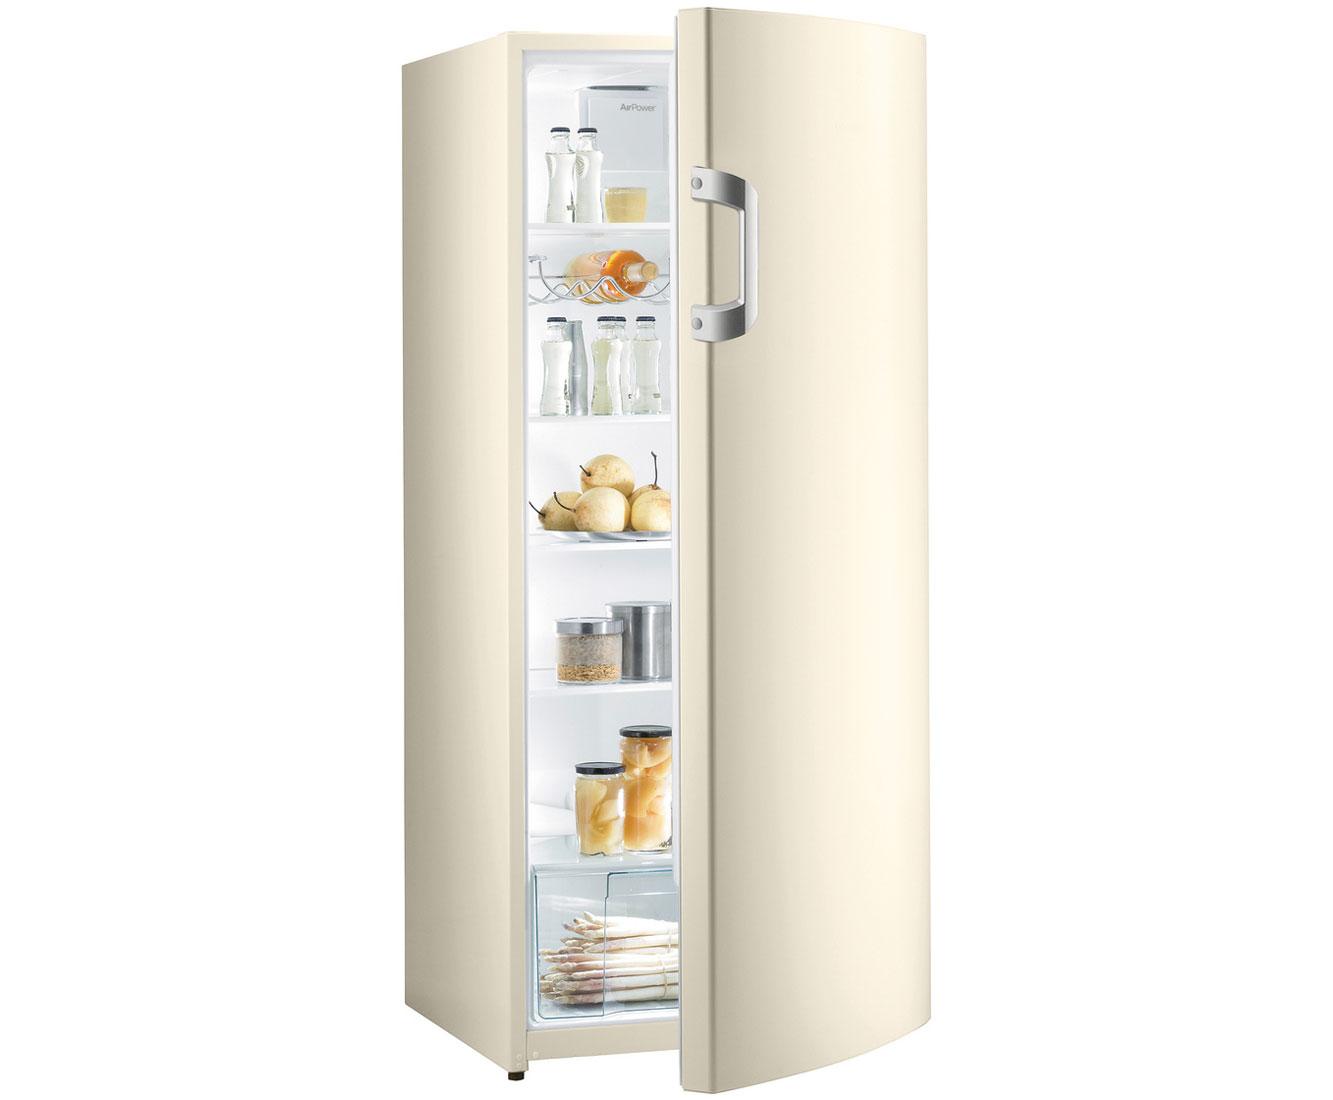 Gorenje Kühlschrank Geräusche : Gorenje r bc kühlschrank champagner a